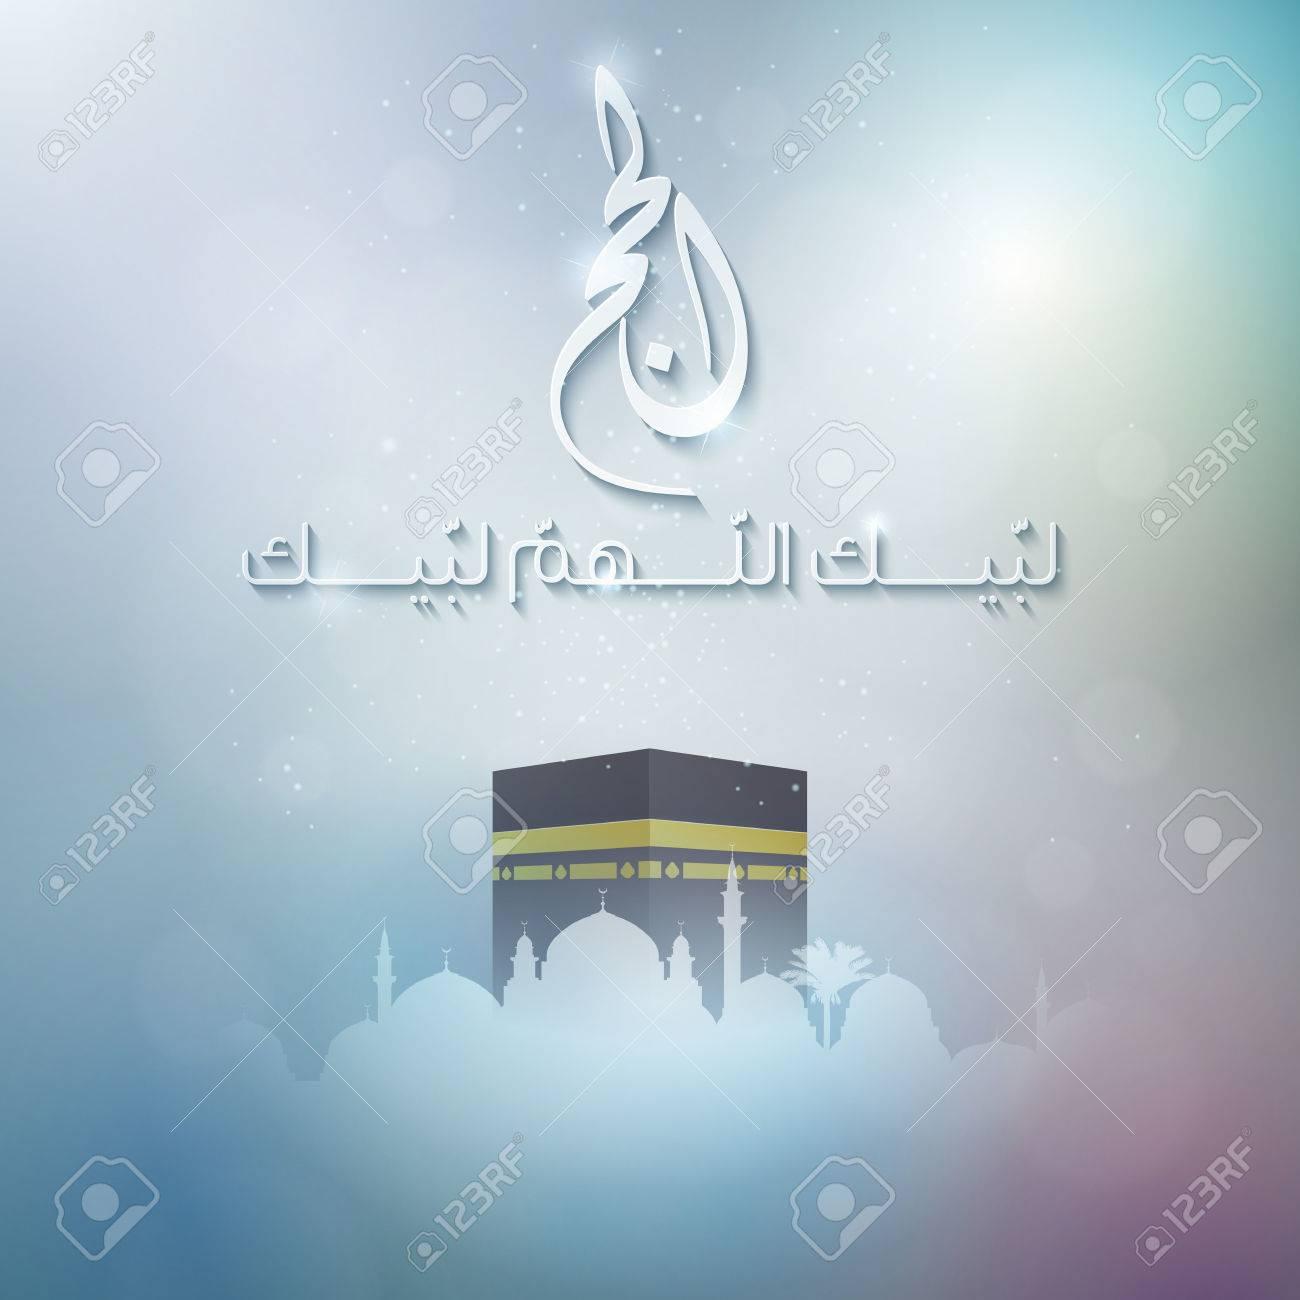 Hajj kaaba and mosque eid mubarak islamic calligraphy for banner hajj kaaba and mosque eid mubarak islamic calligraphy for banner stock vector 56800787 m4hsunfo